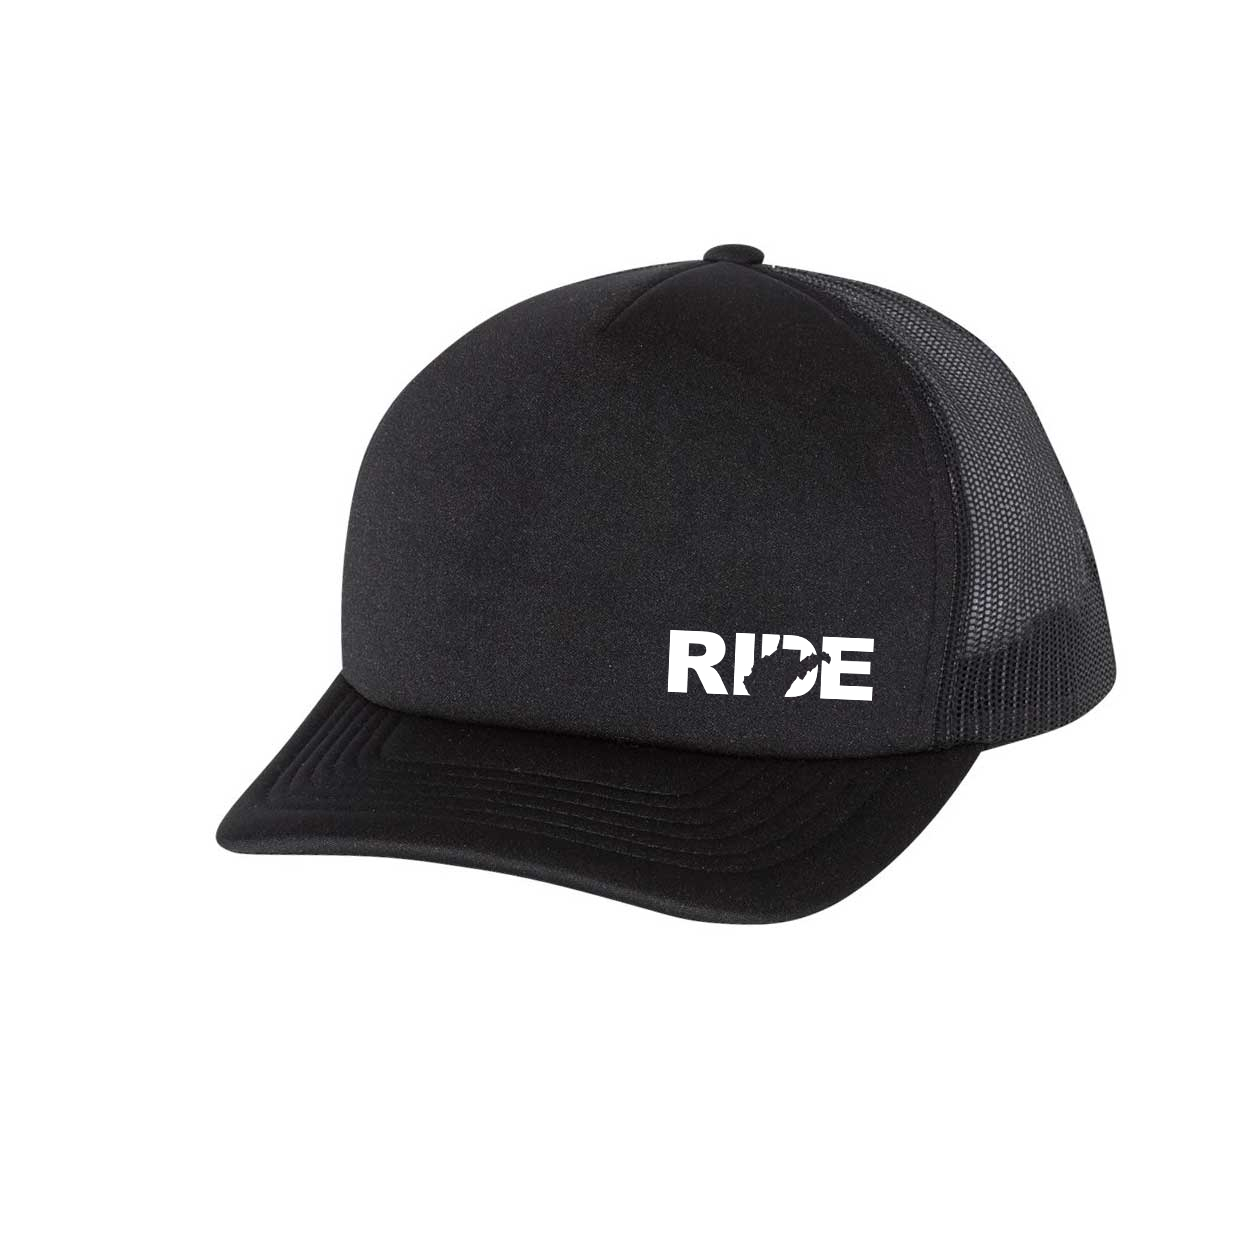 Ride West Virginia Night Out Premium Foam Trucker Snapback Hat Black (White Logo)